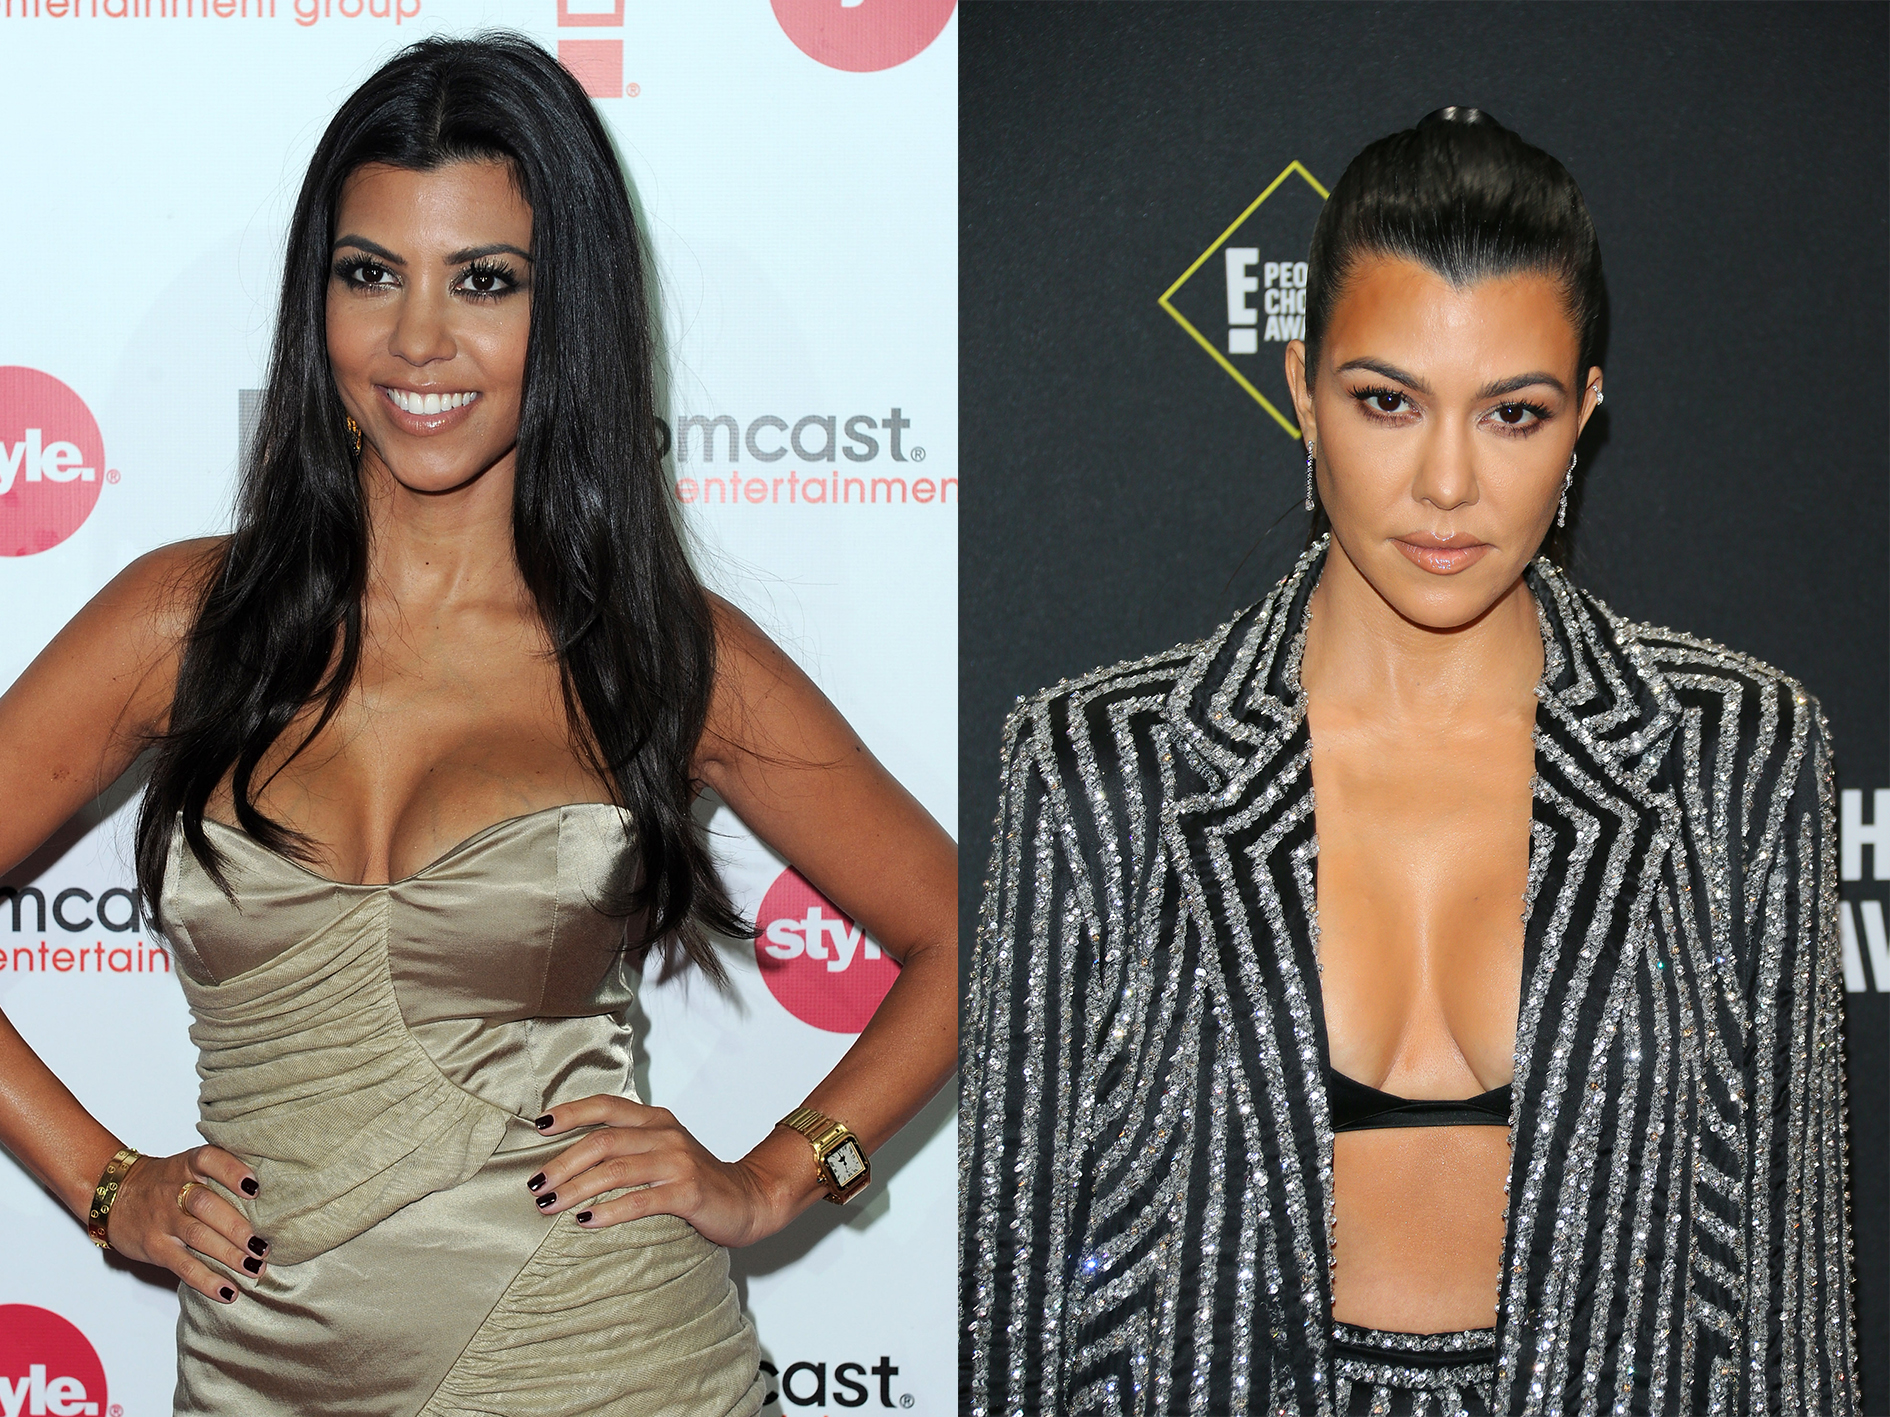 kardashians decennium transformaties